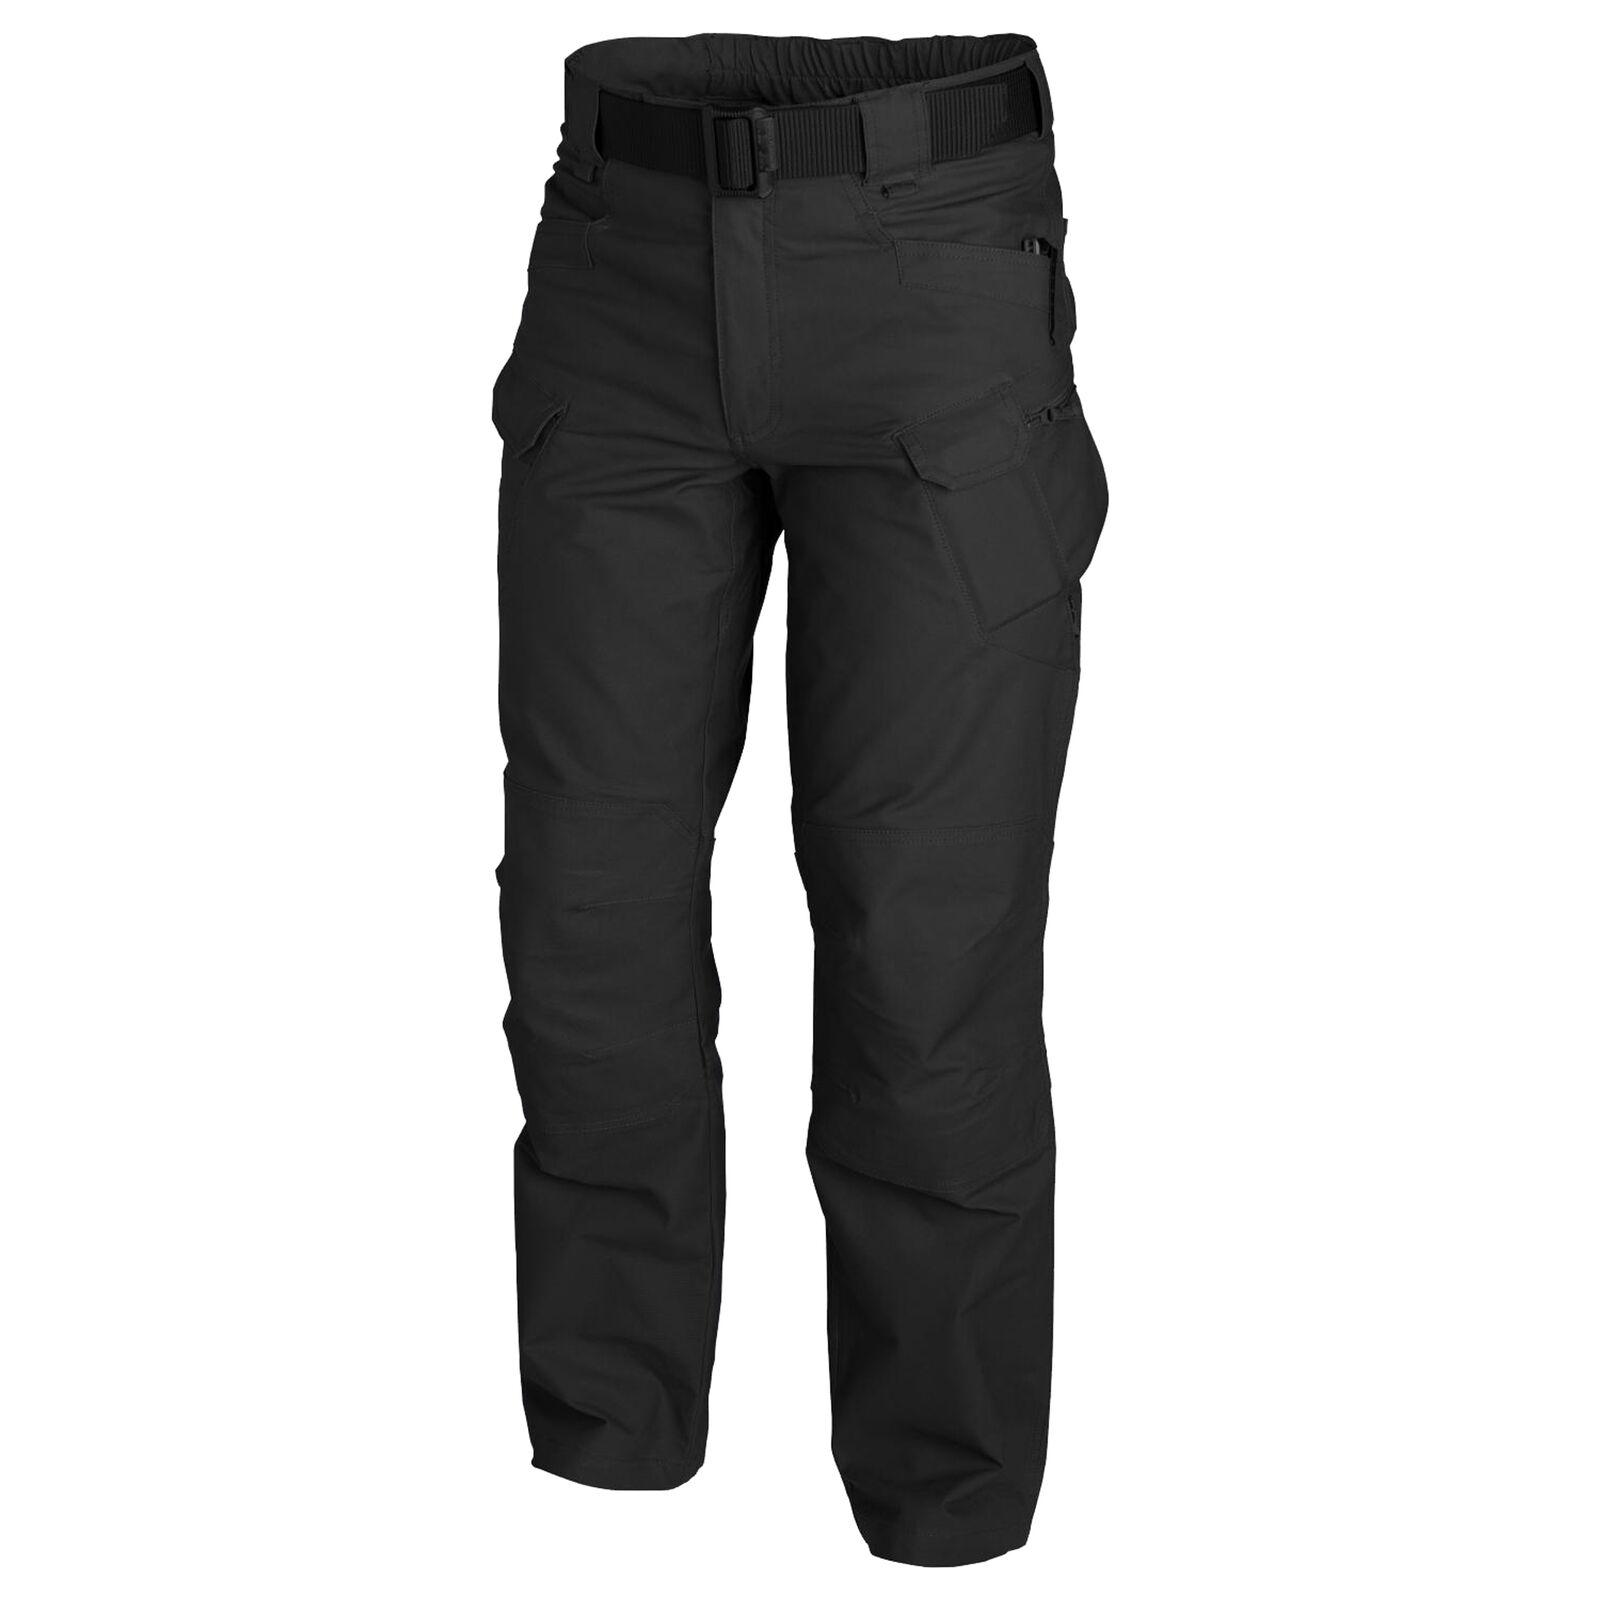 Helikon-Tex Urban Tactical Pants TAKTISCHE HOSE -Polycotton Canvas- SCHWARZ